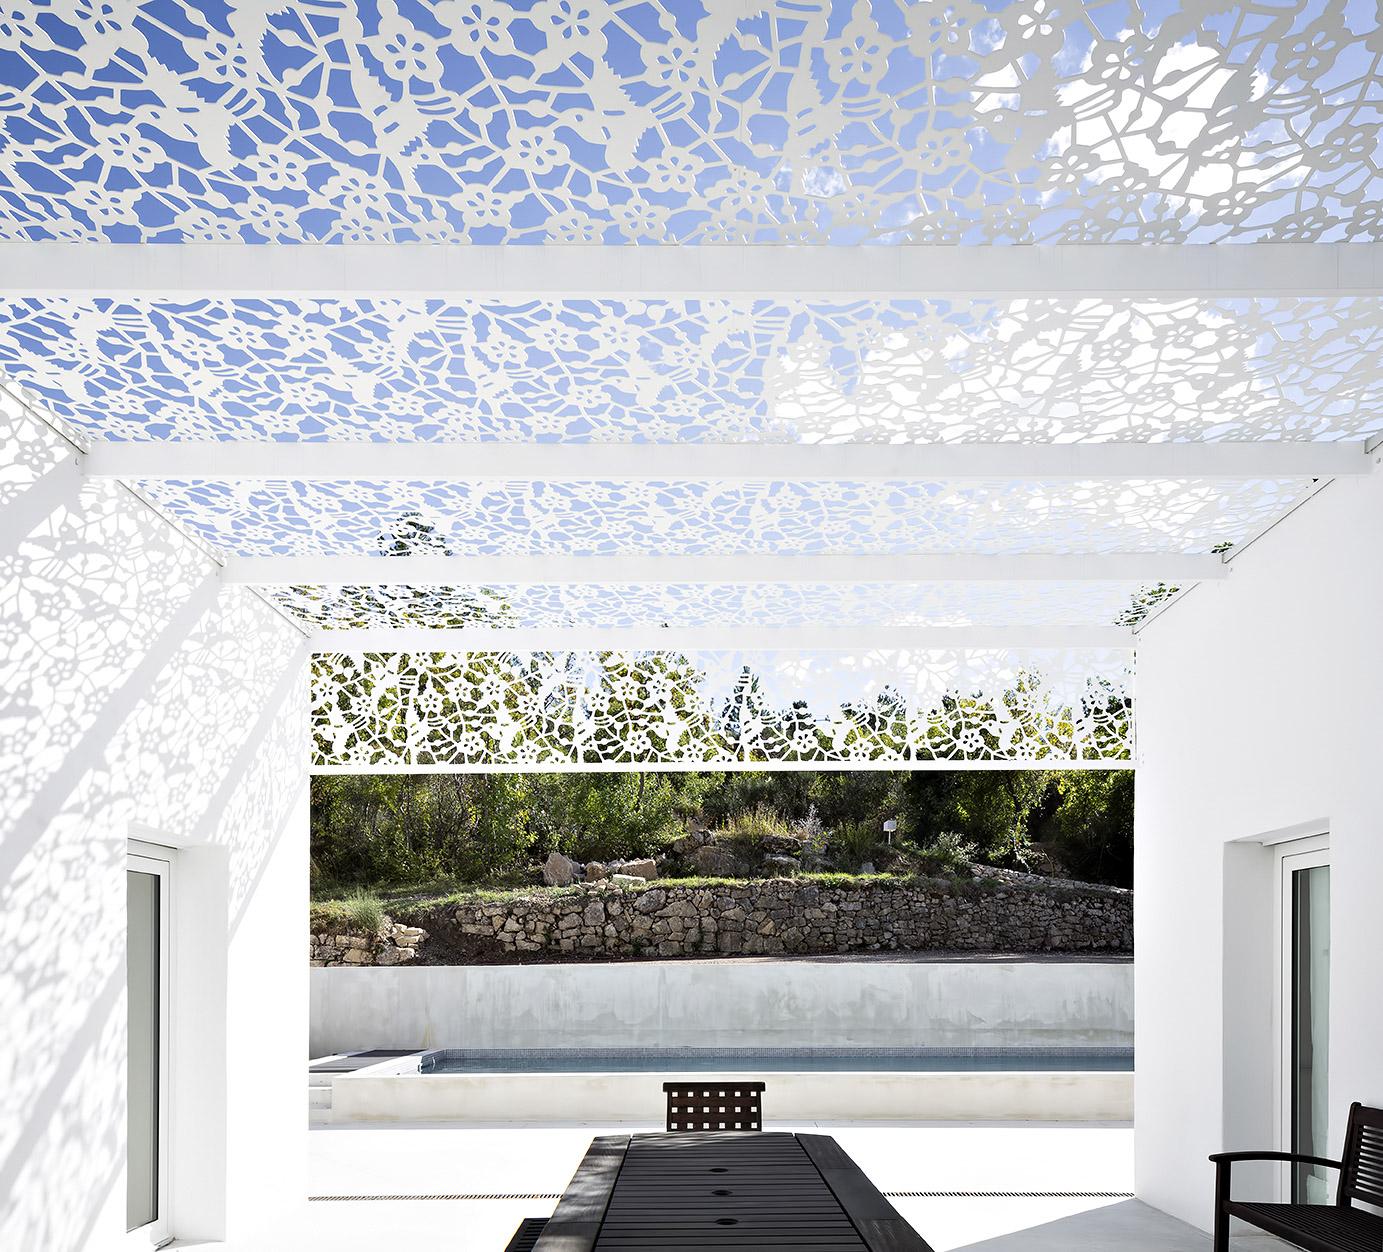 Villa Temperee Residence - Lodève, Hérault, Occitanie, France